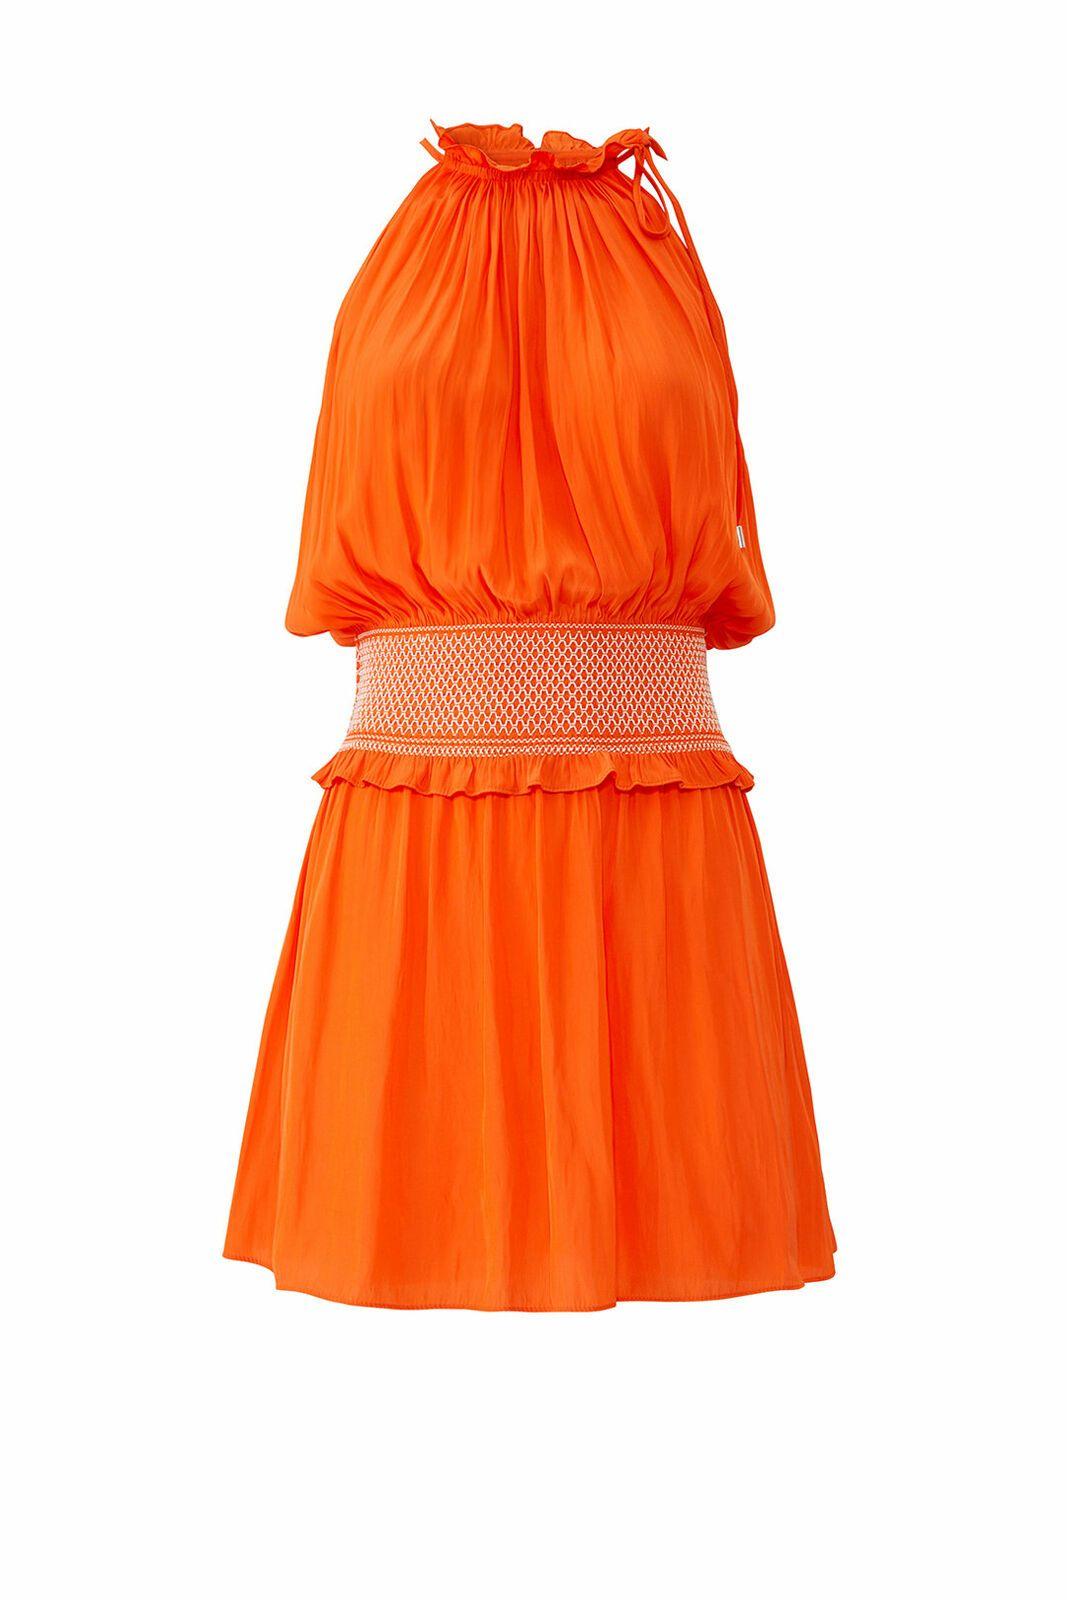 Account Suspended Orange Dress Womens Dresses Dresses [ 1600 x 1067 Pixel ]